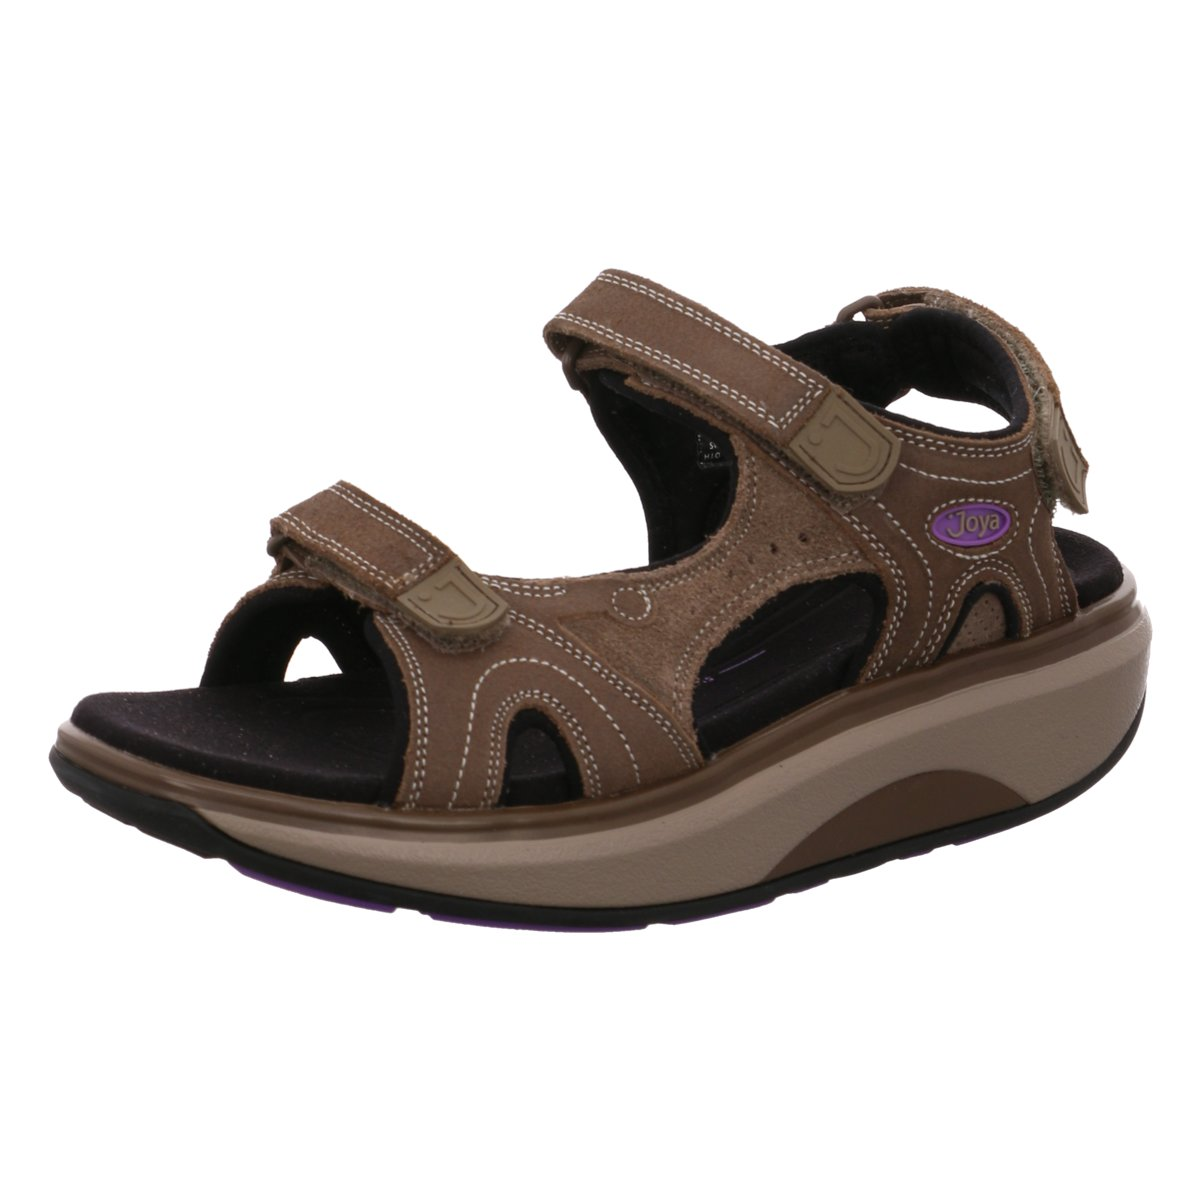 Joya Damen Sandaletten Cairo2,Soft-Roll,bra 717san braun 458262